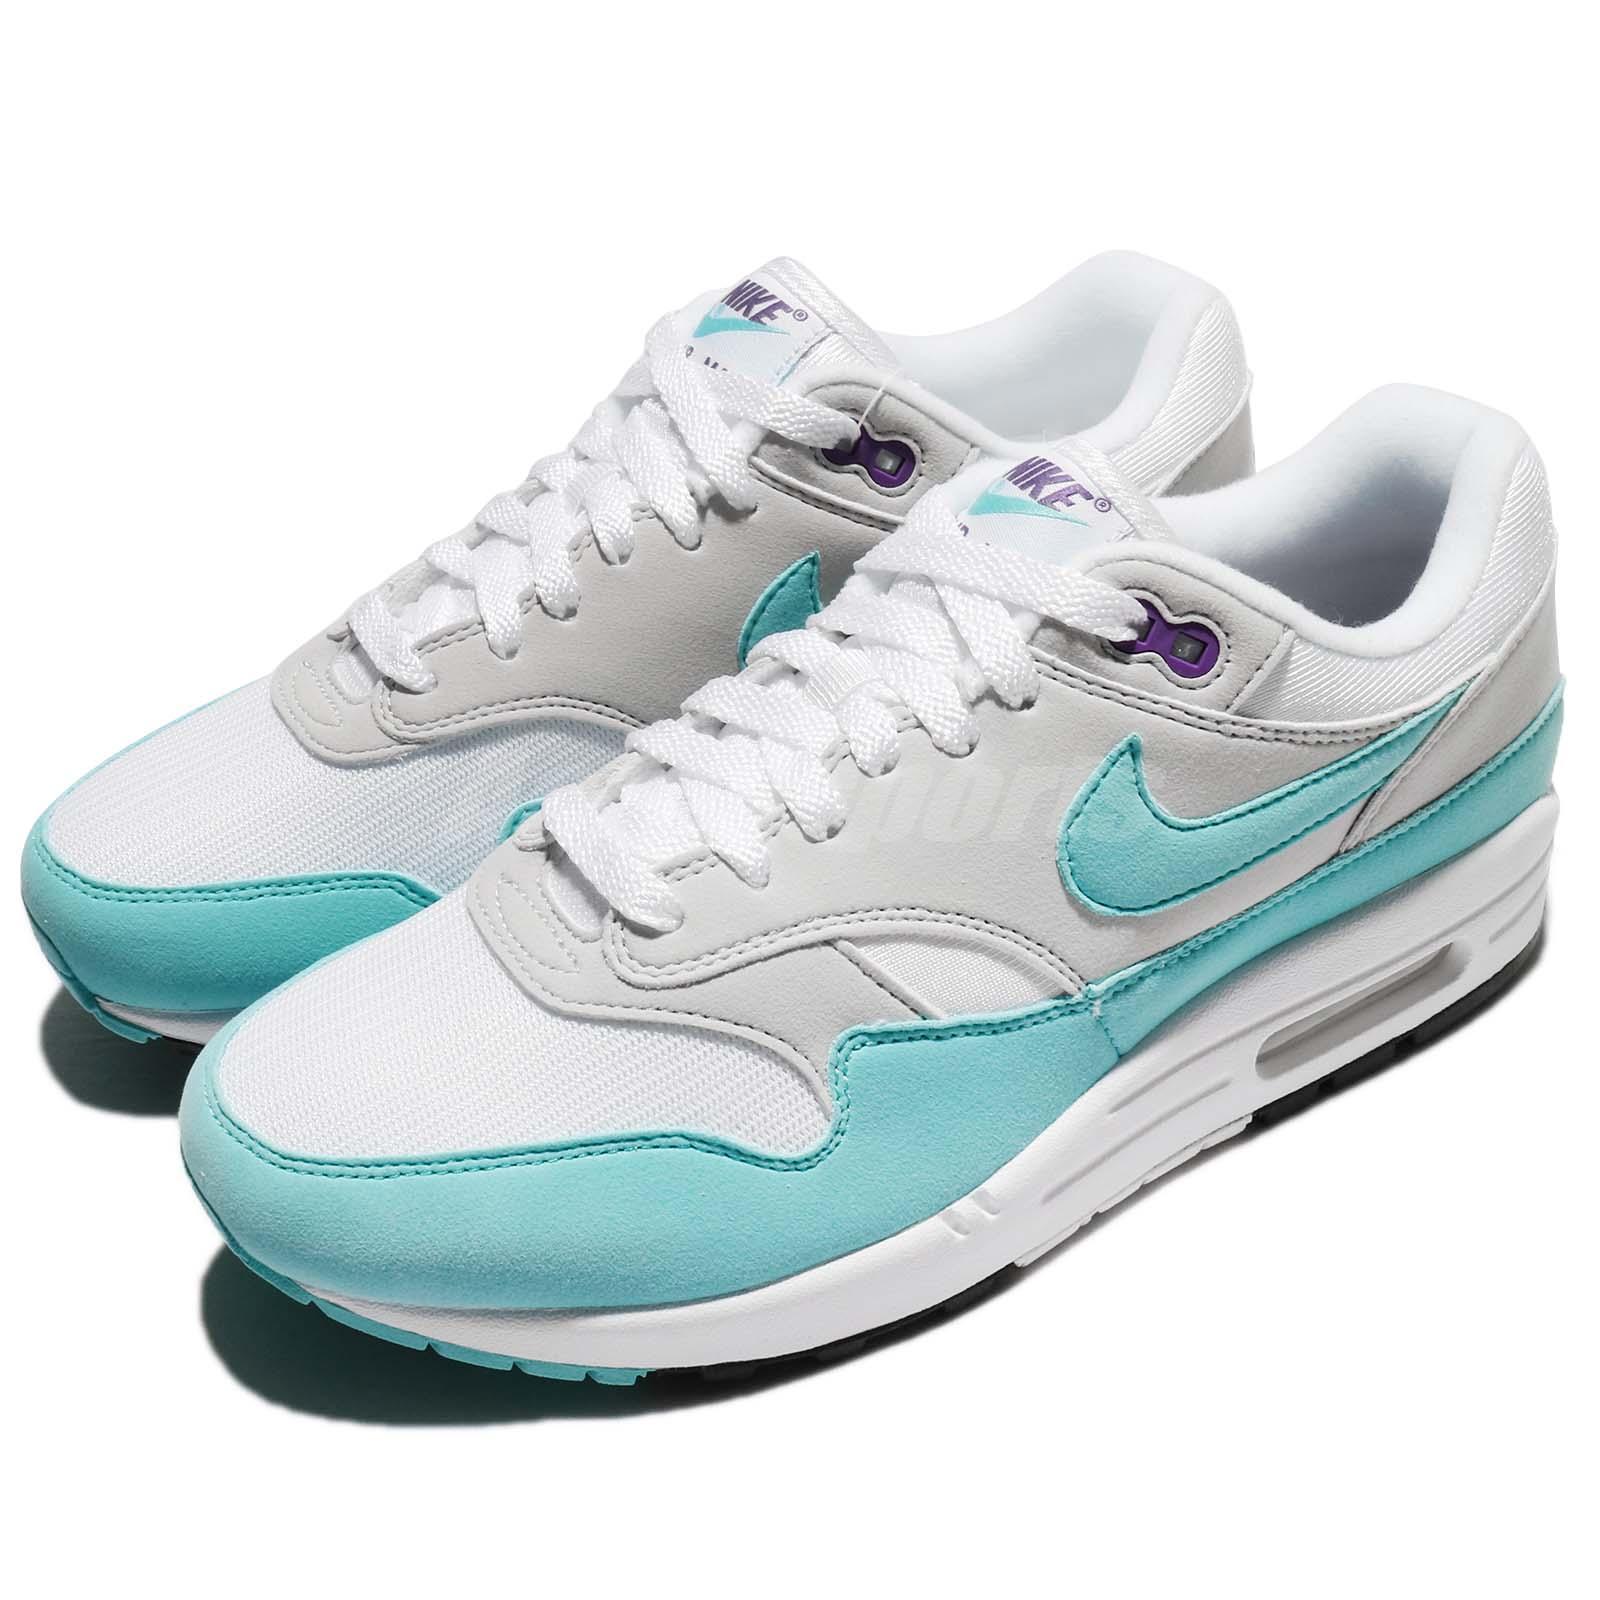 Details about Nike Air Max 1 Anniversary OG Aqua White Blue Men Running  Shoes 908375-105 b37b3853a